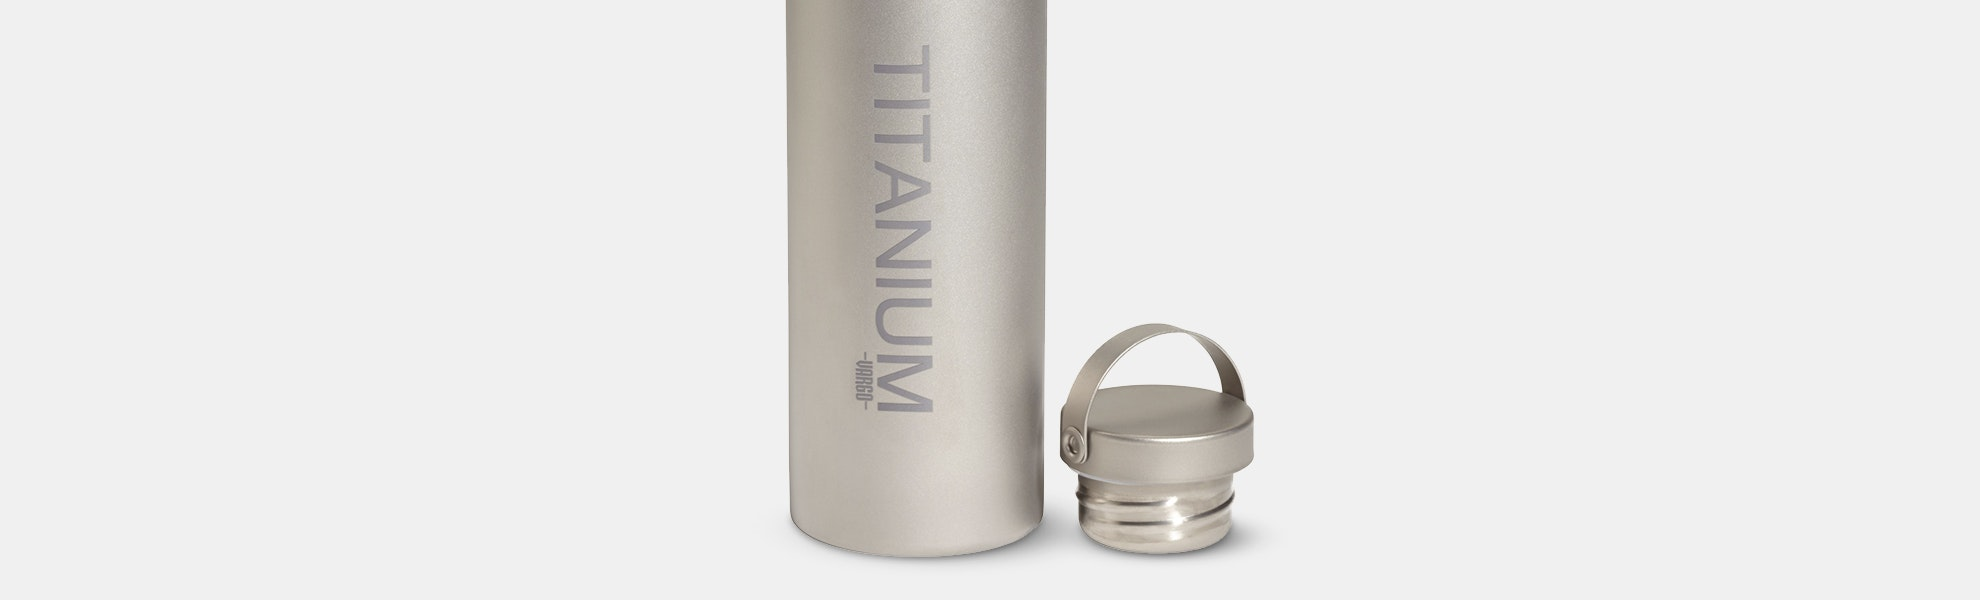 Vargo Titanium Water Bottle